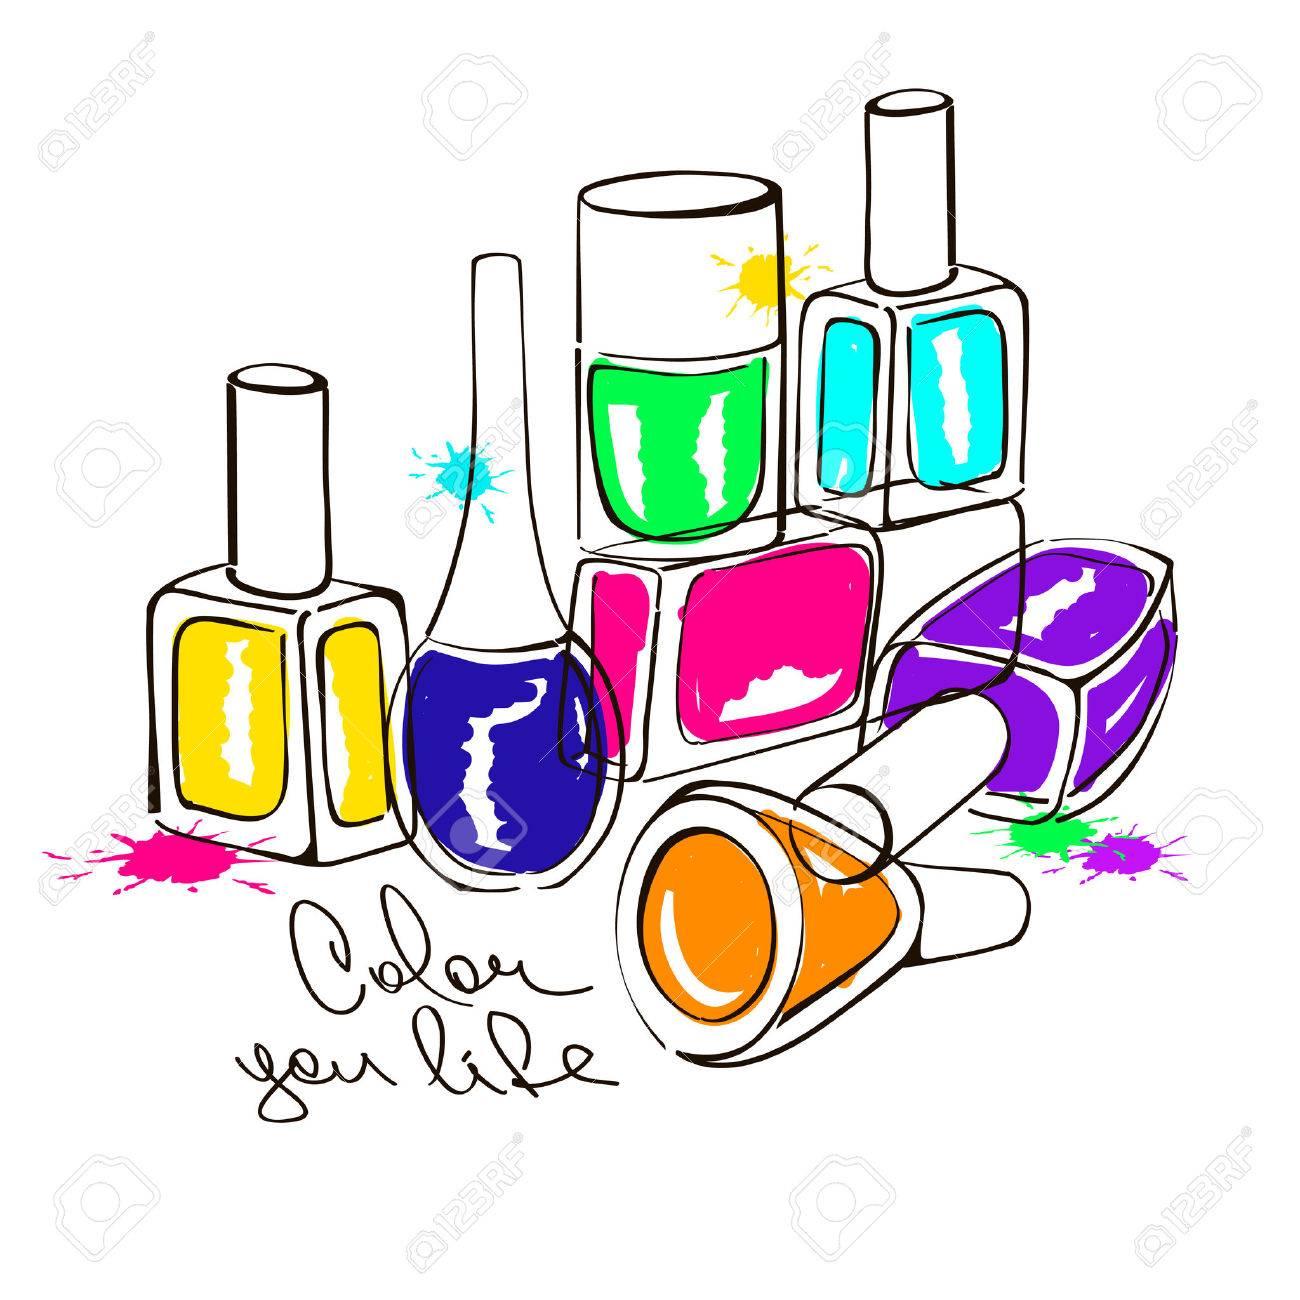 1300x1300 Hand Drawn Illustration With Colorful Nail Polish Bottles Royalty